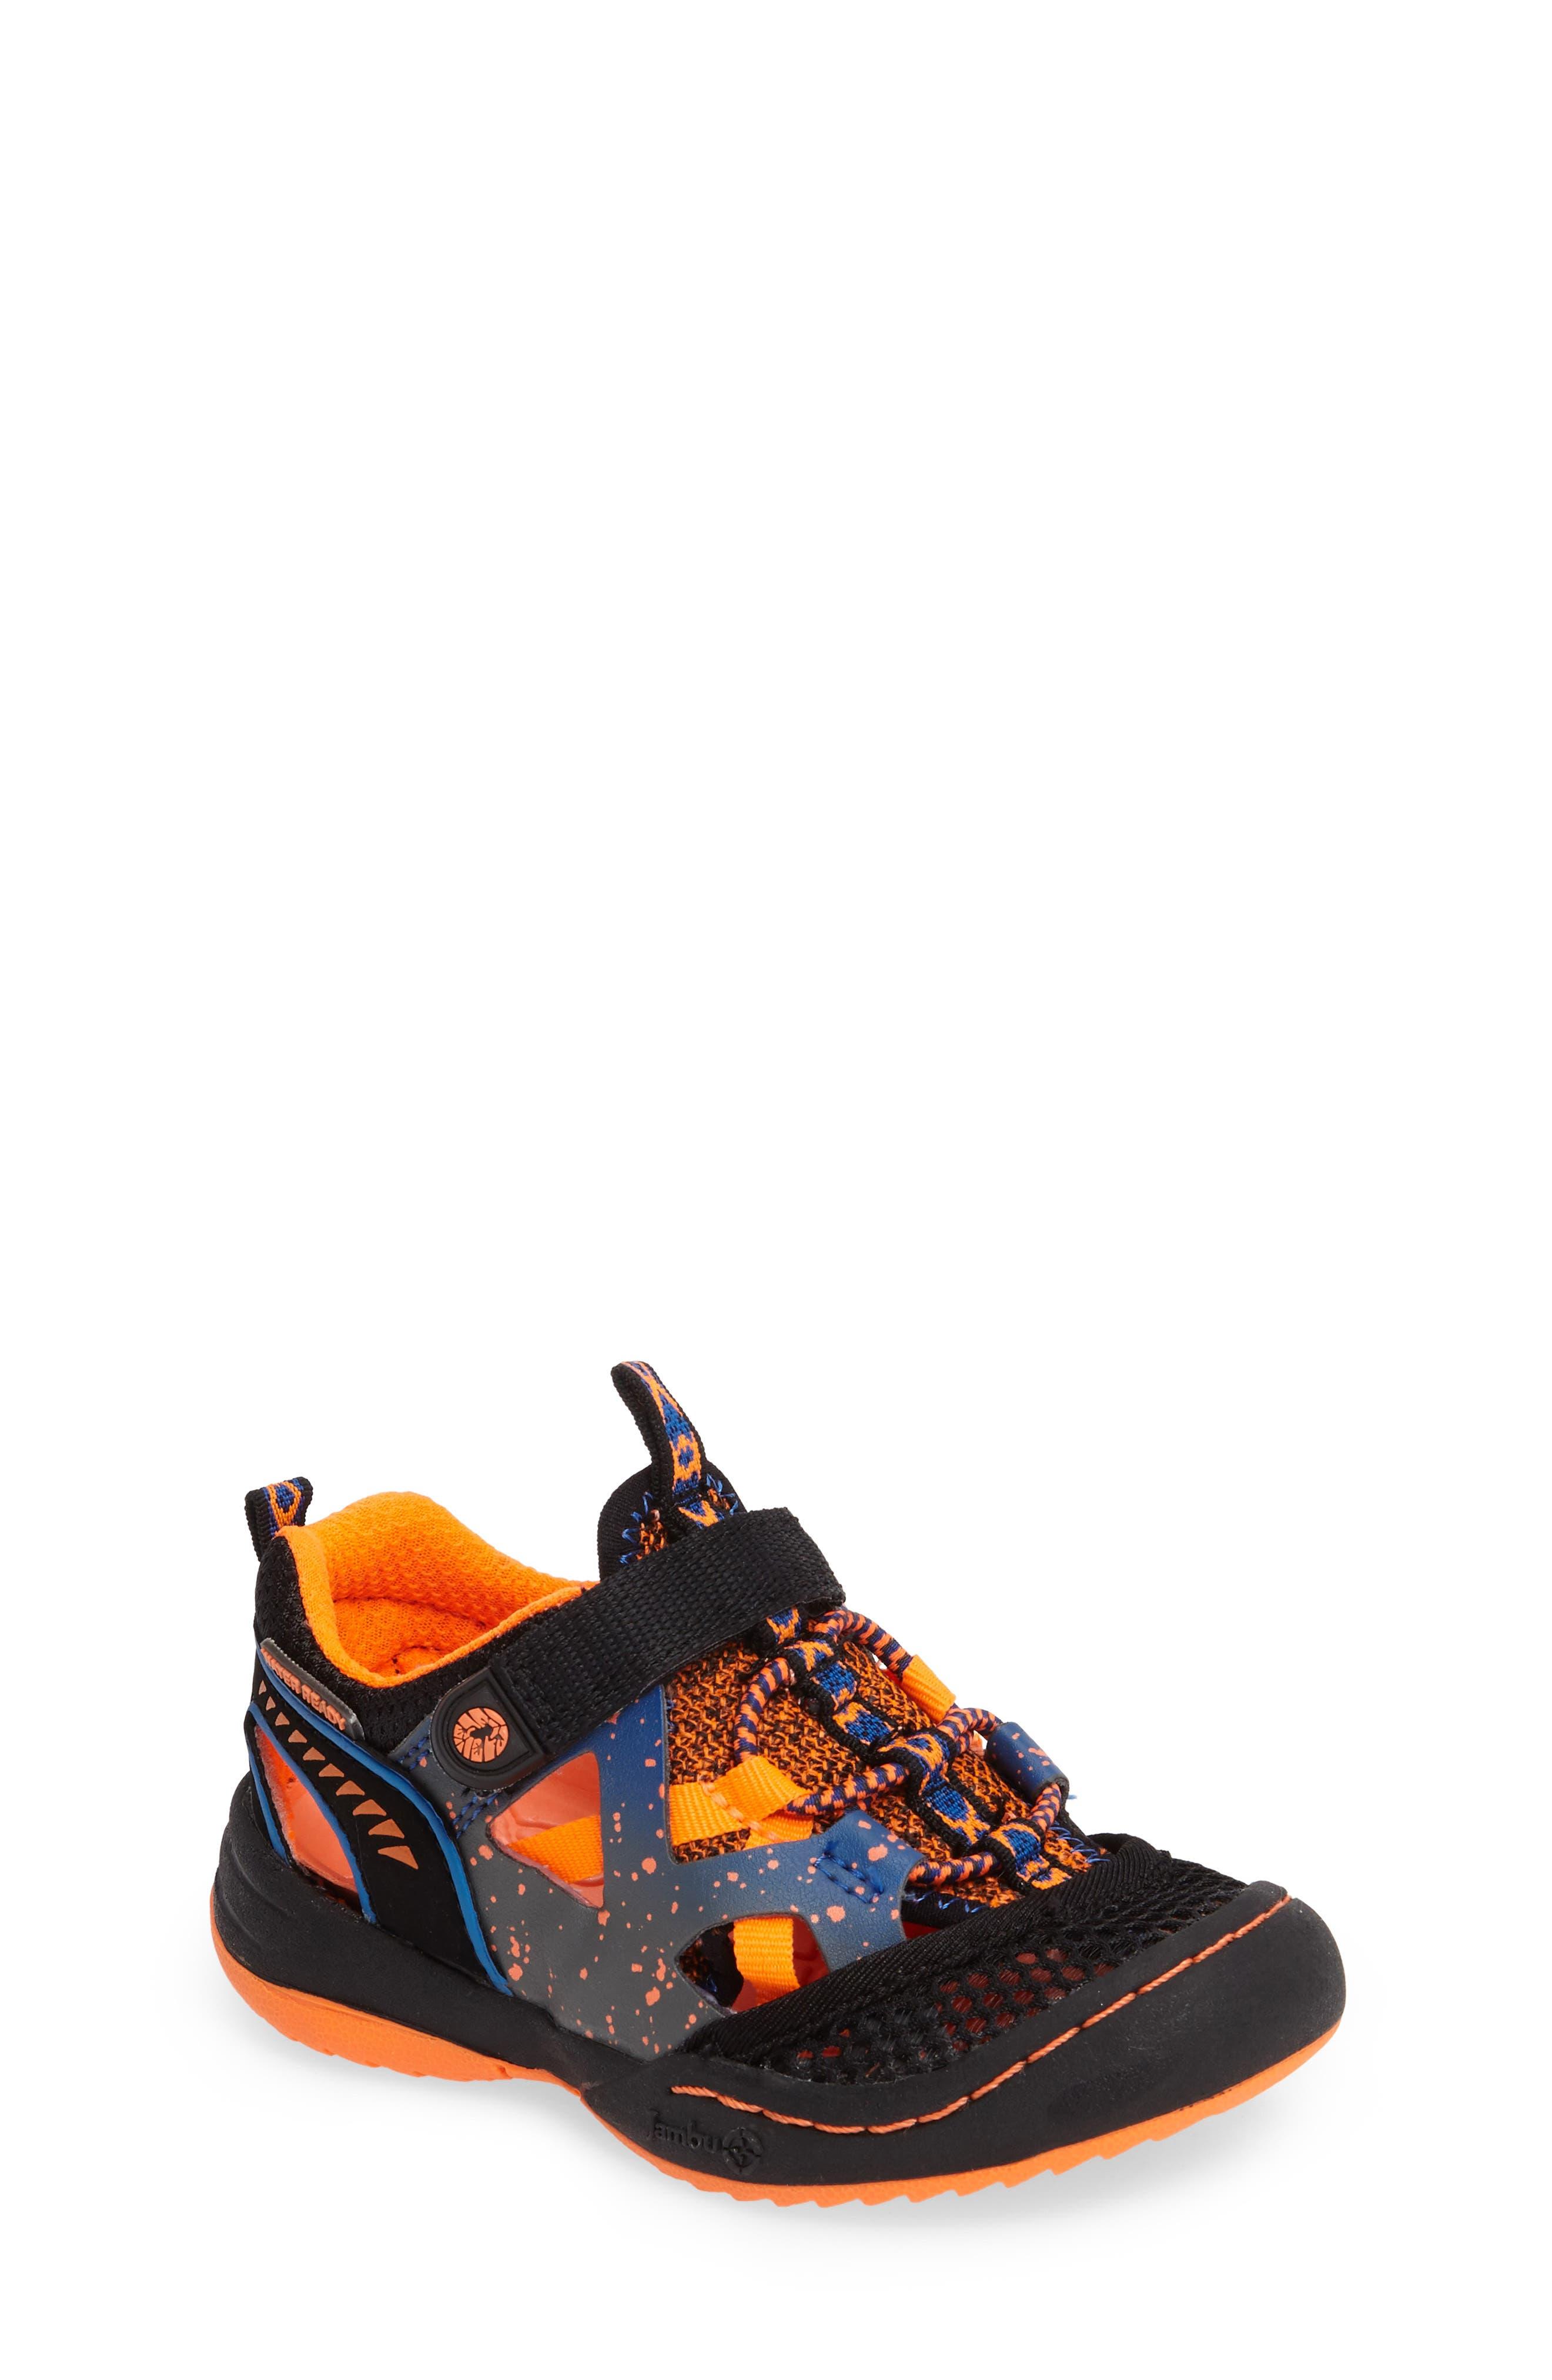 Squamata Sport Sneaker,                         Main,                         color, Black/ Orange